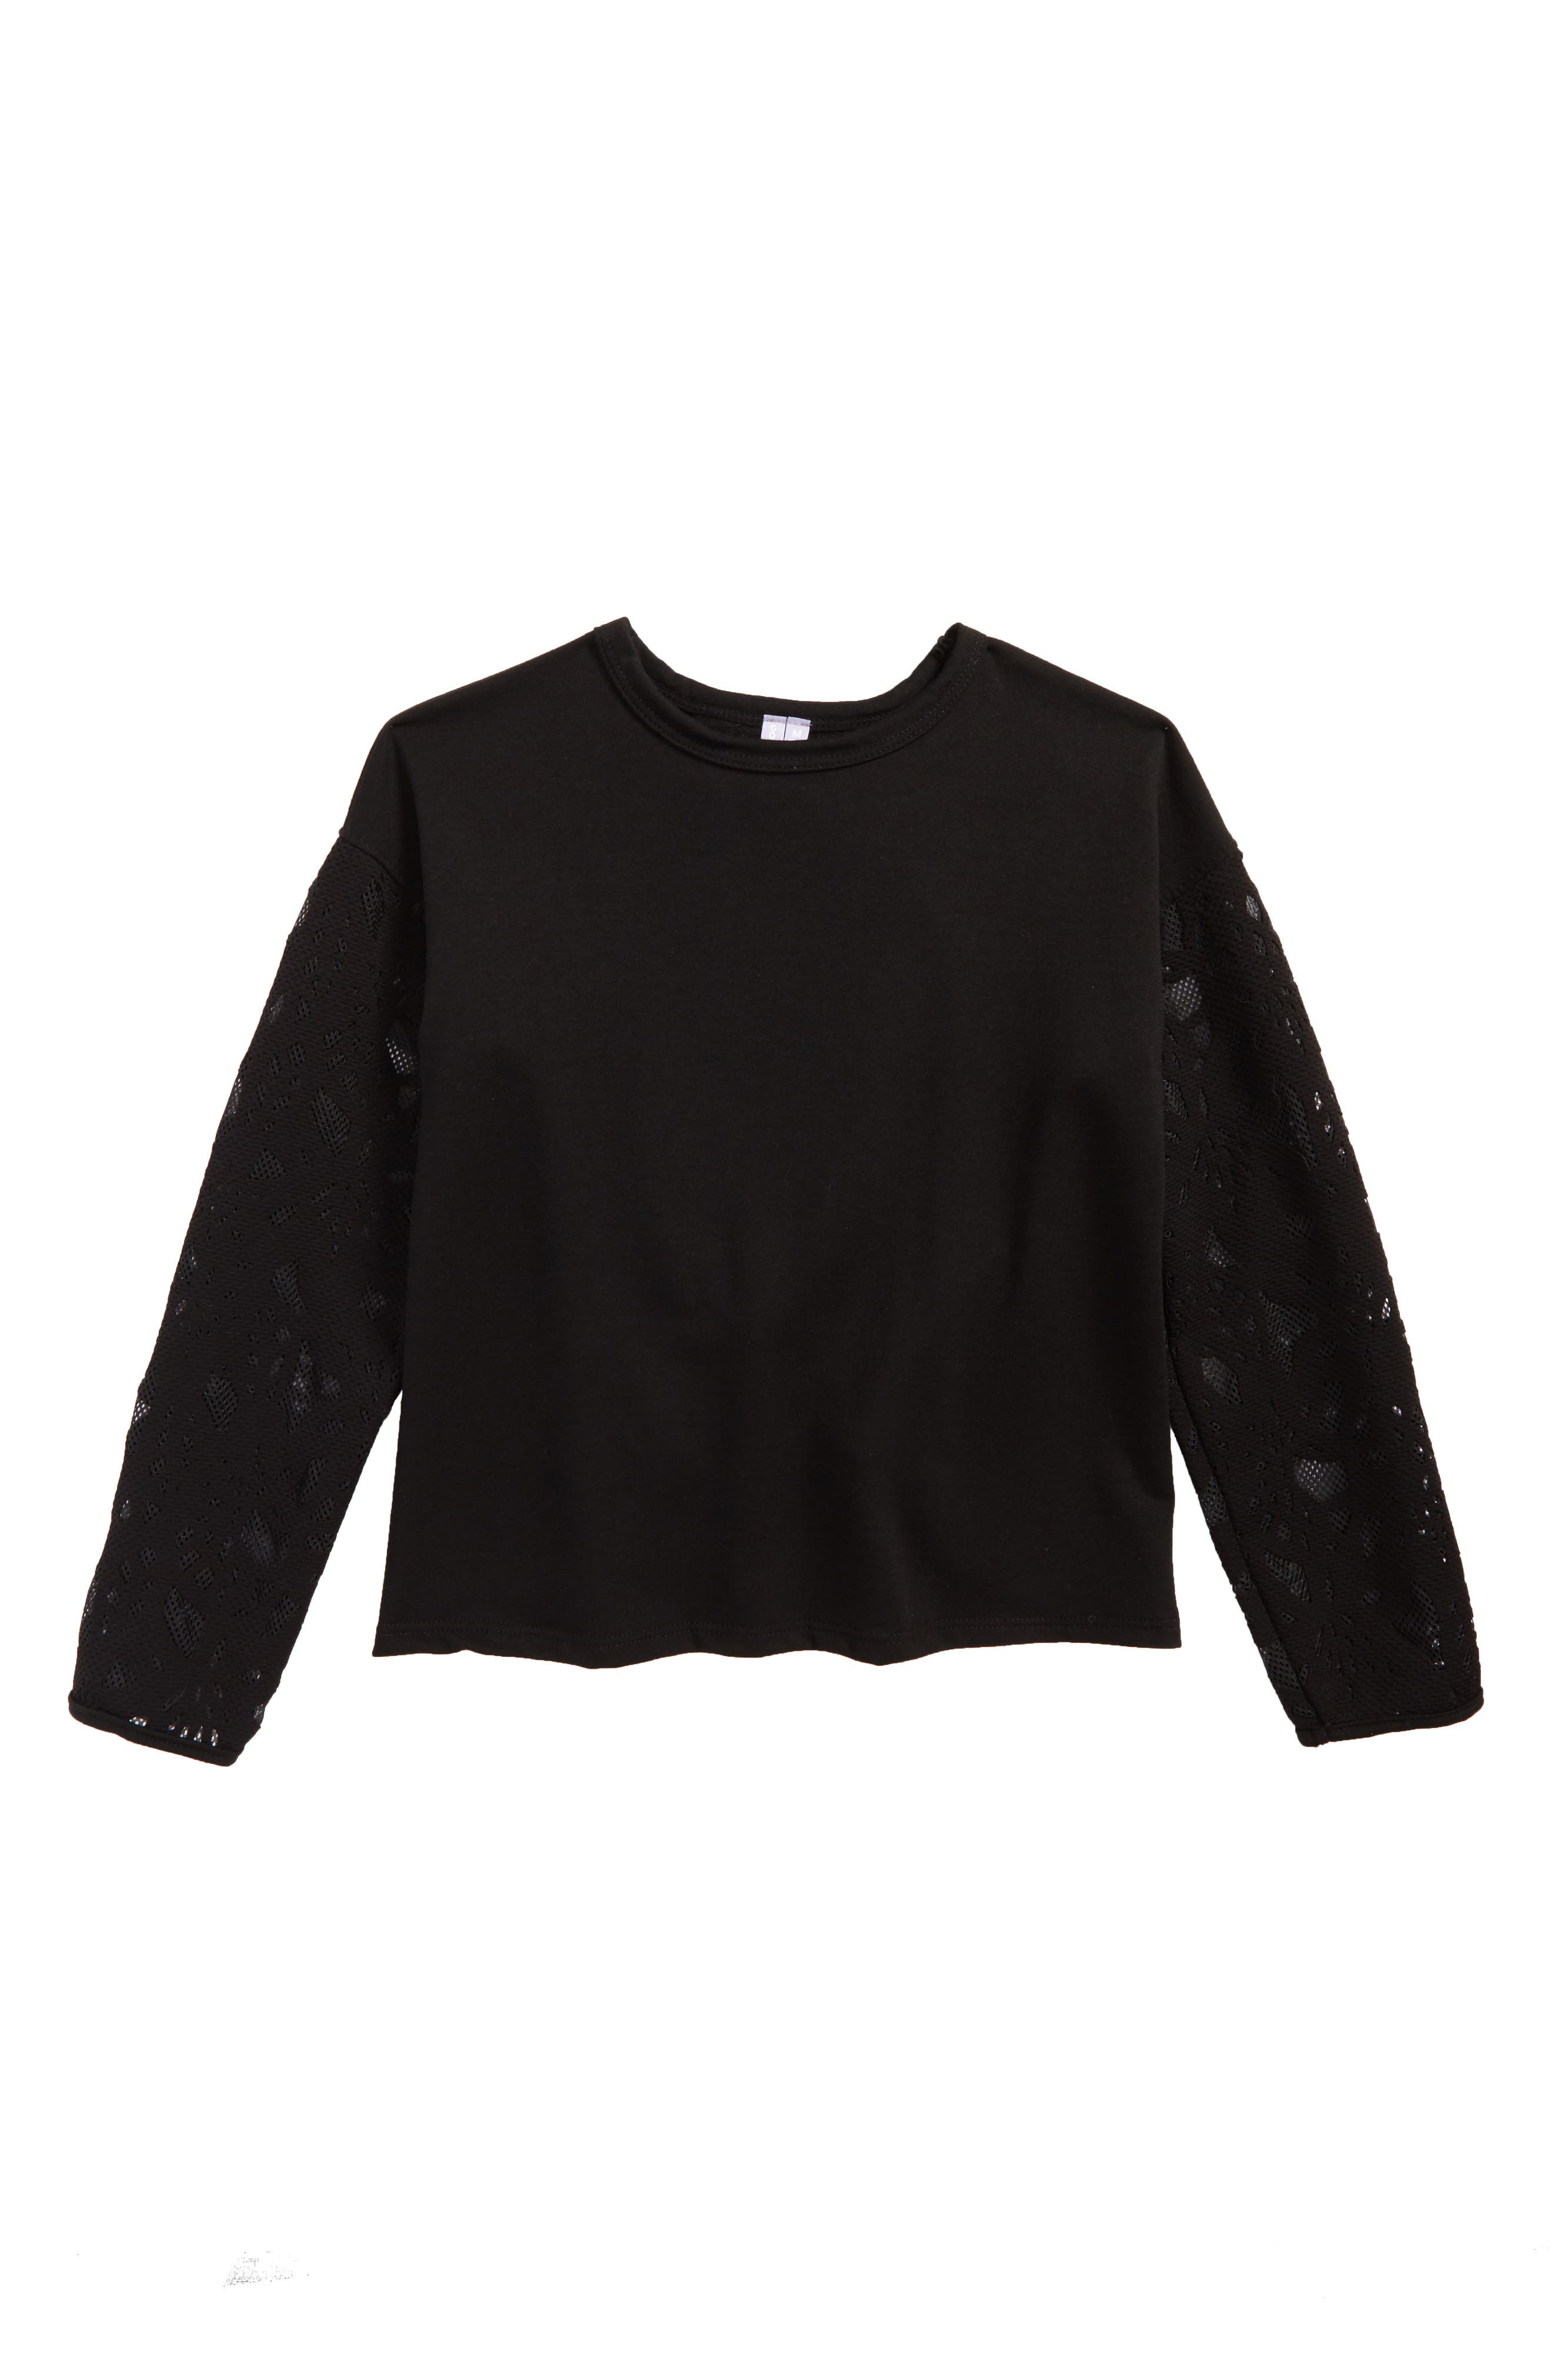 Contrast Sleeve Sweatshirt,                             Main thumbnail 1, color,                             Black